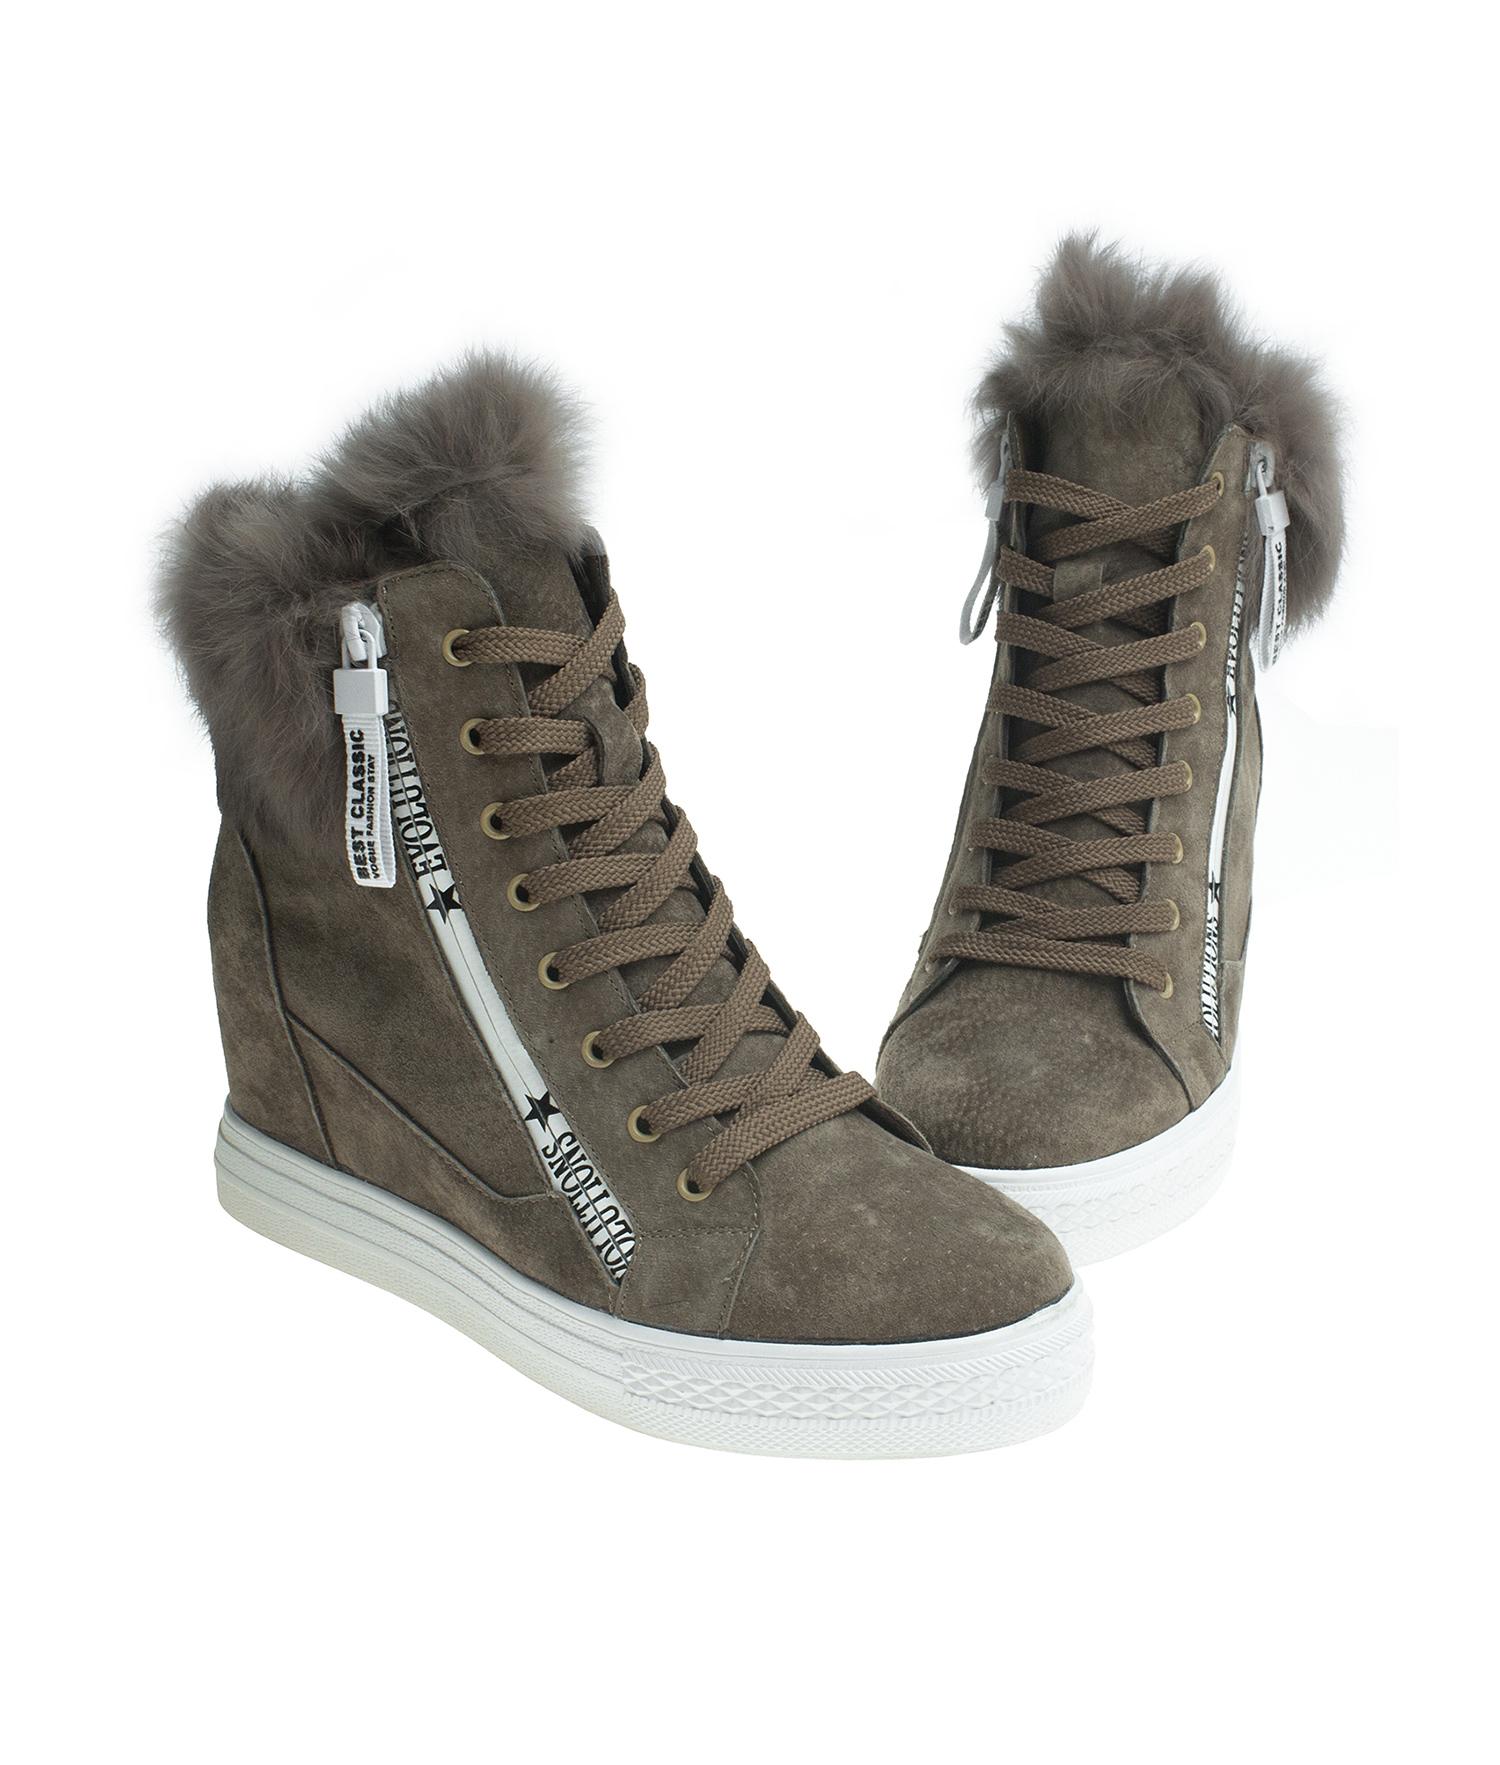 Fur Trim Suede Hi Top Sneaker Boots Annakastleshoes Com